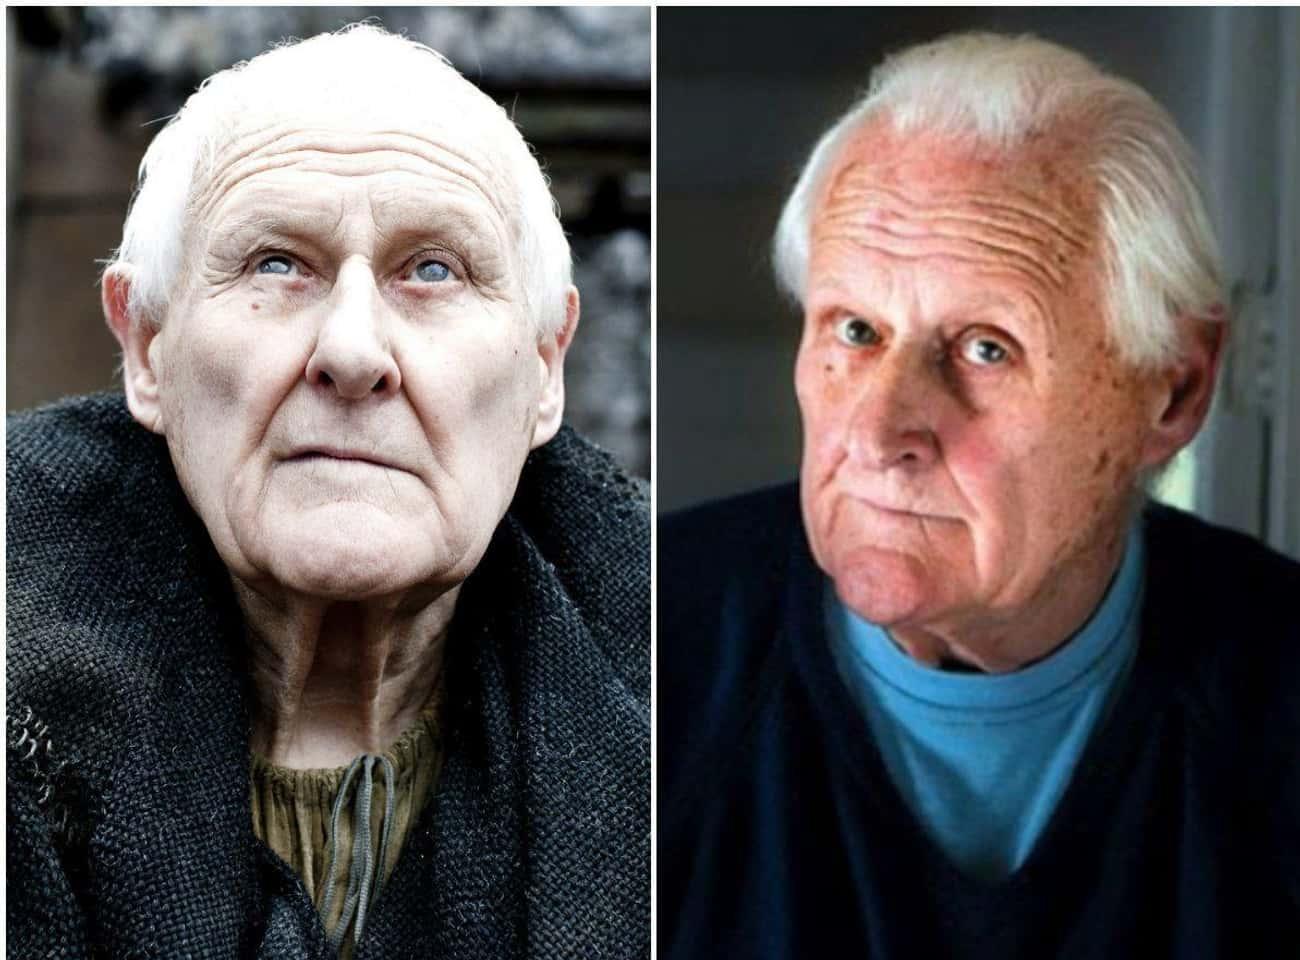 Maester Aemon - Peter Vaughan